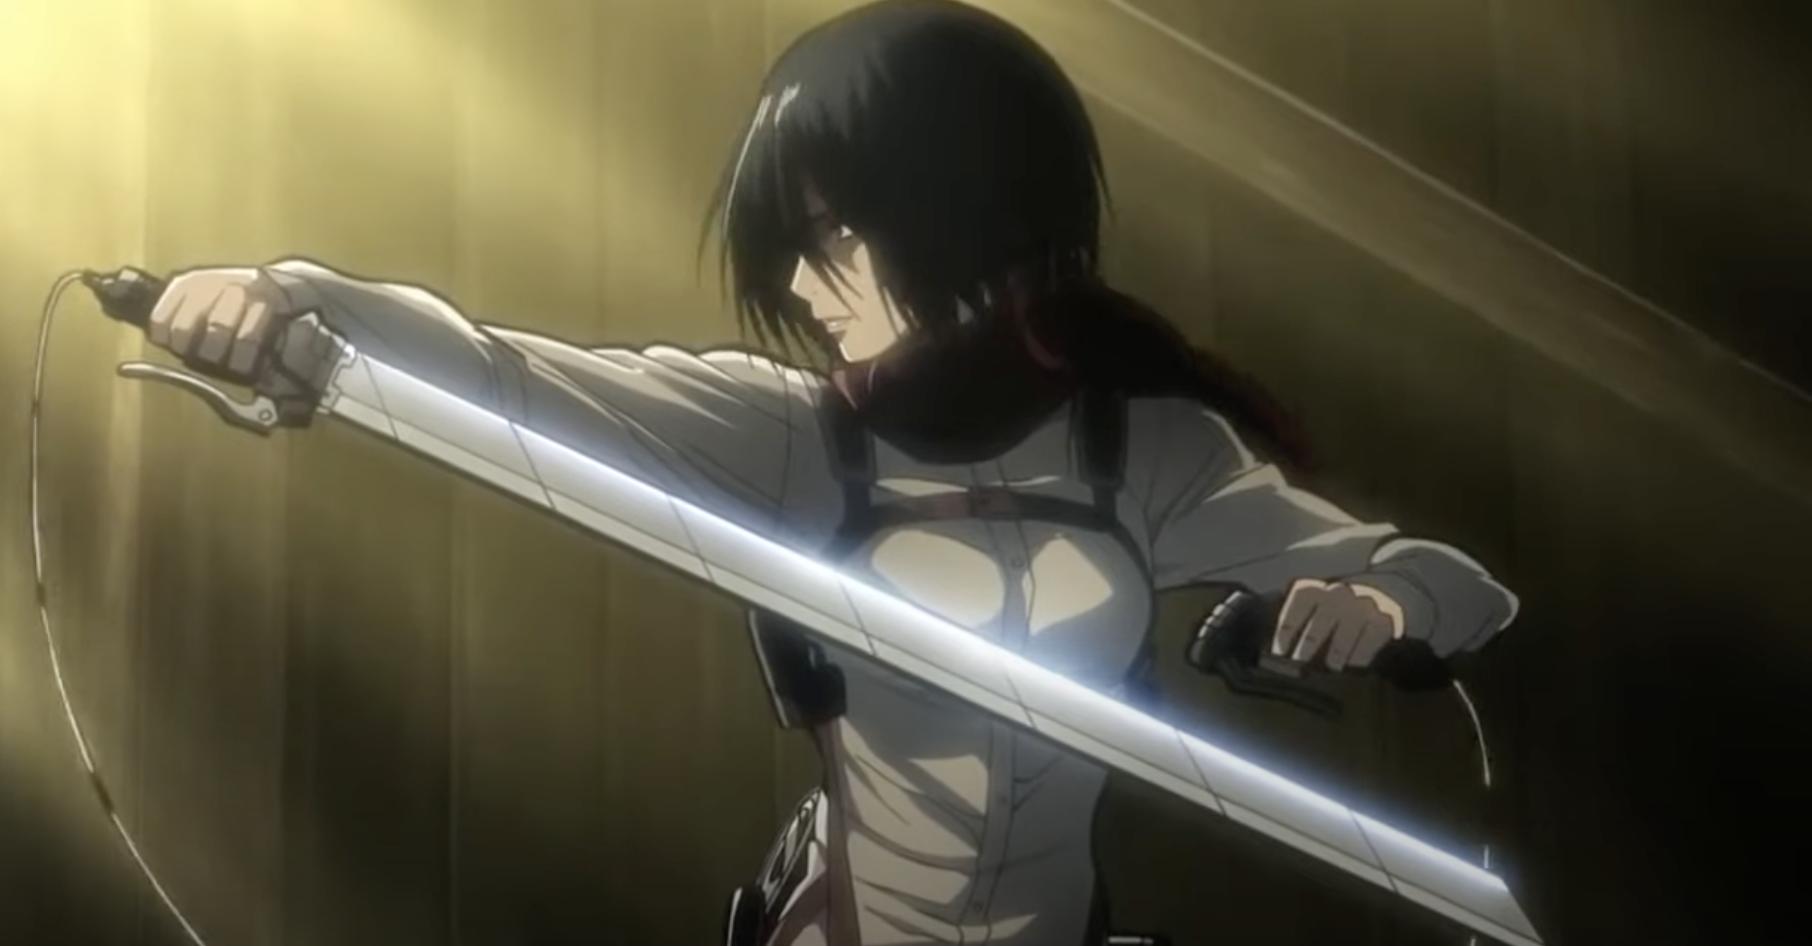 An anime character wielding a sword